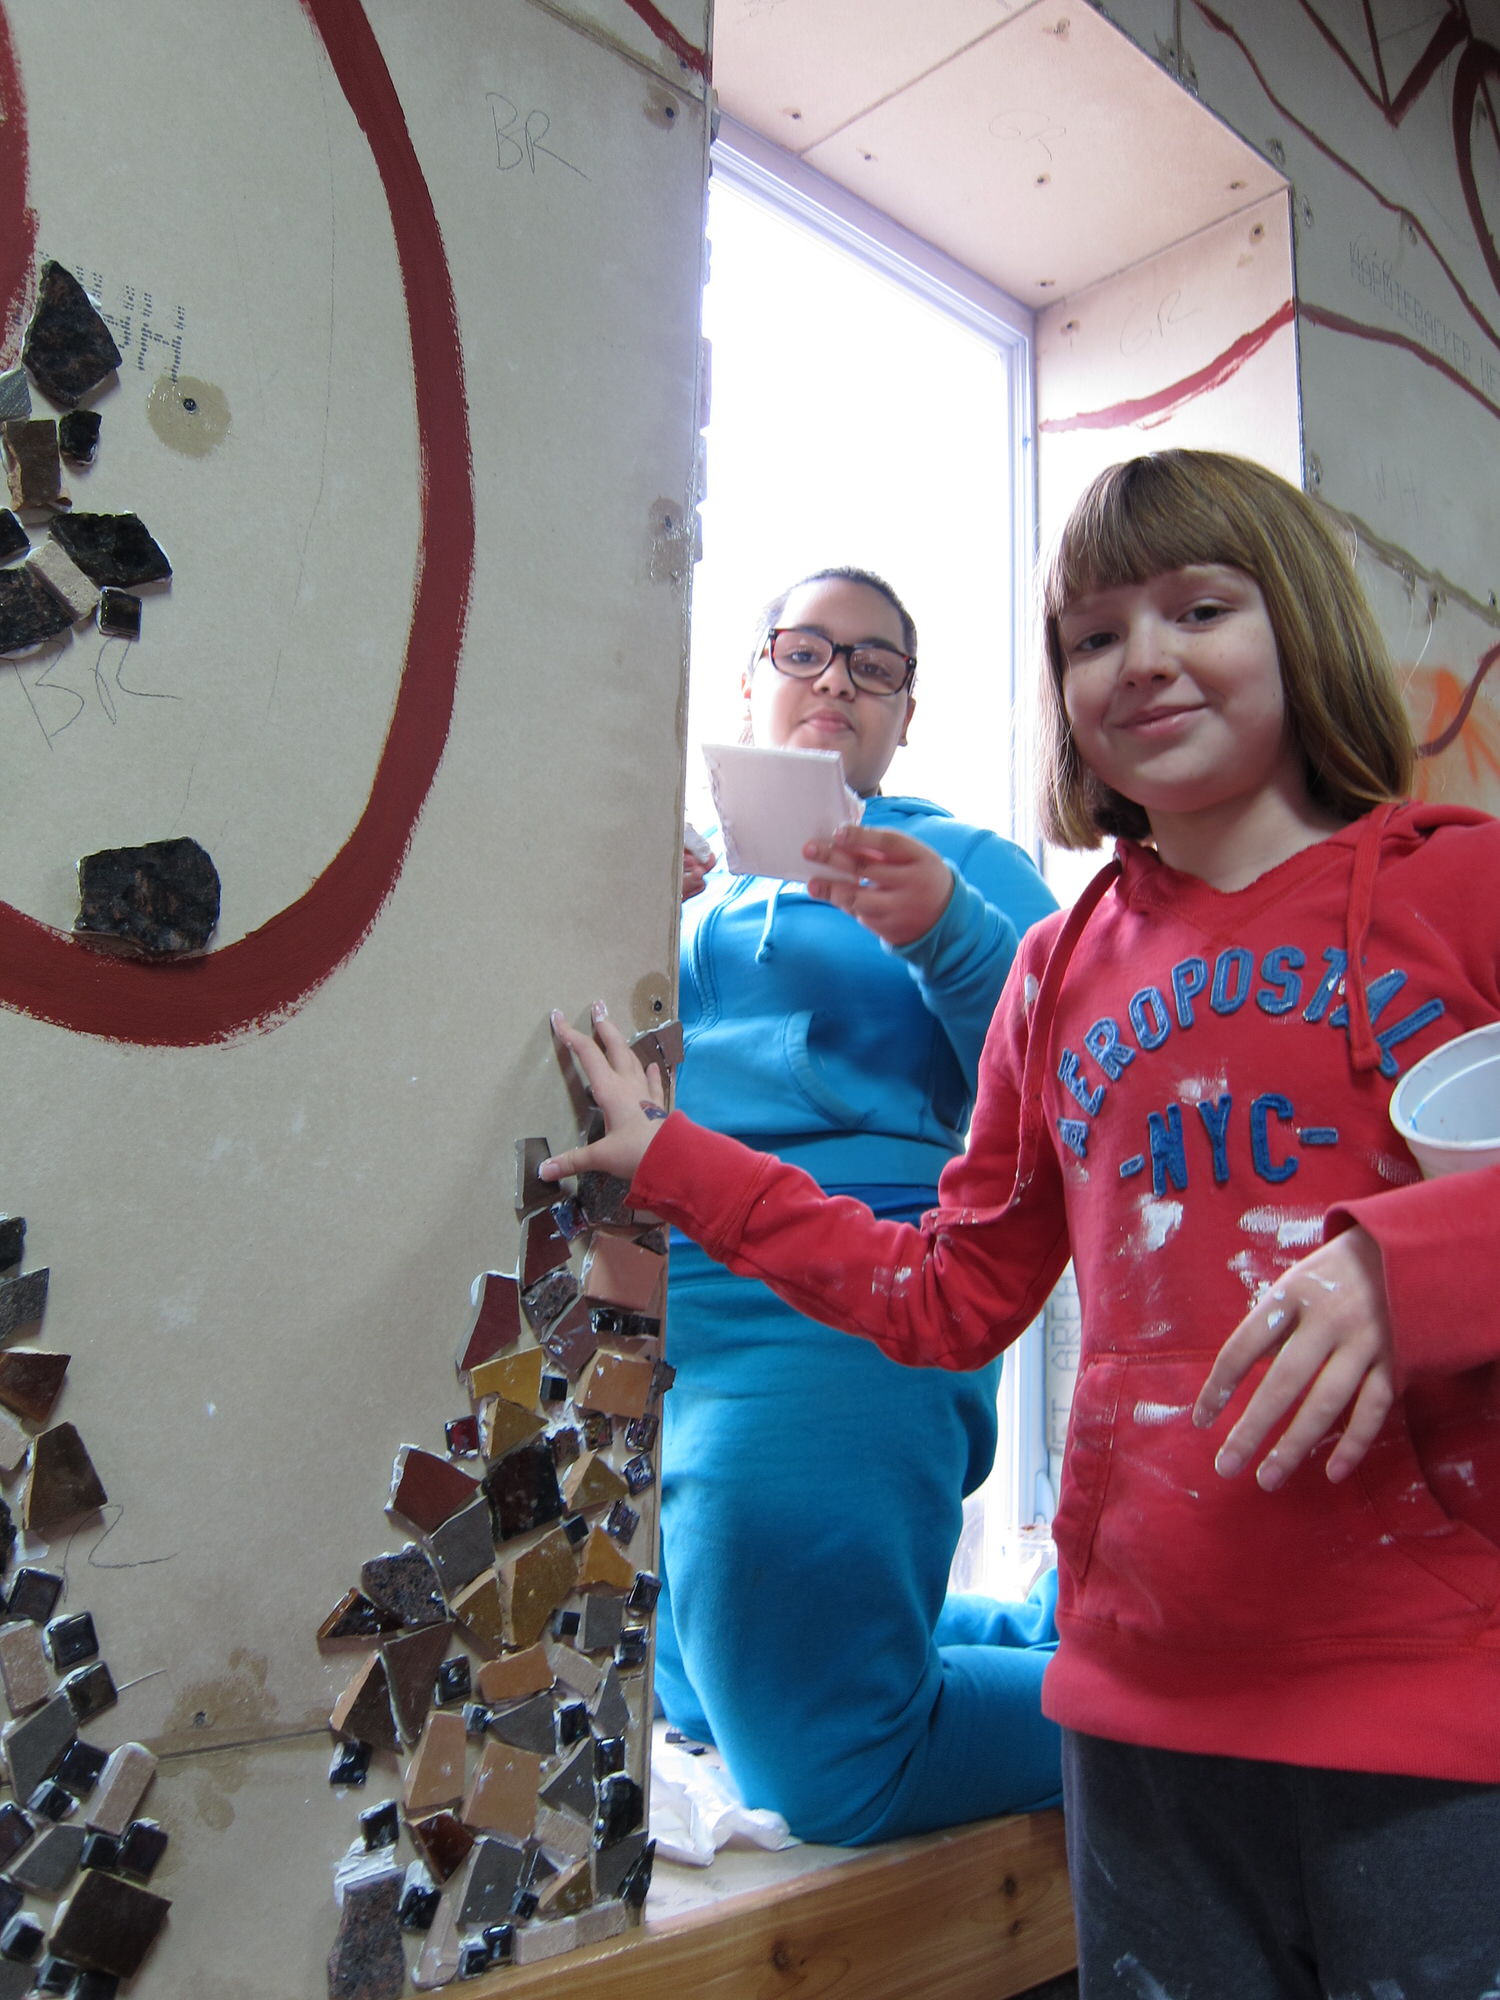 Mosaic Students - Community Leaders